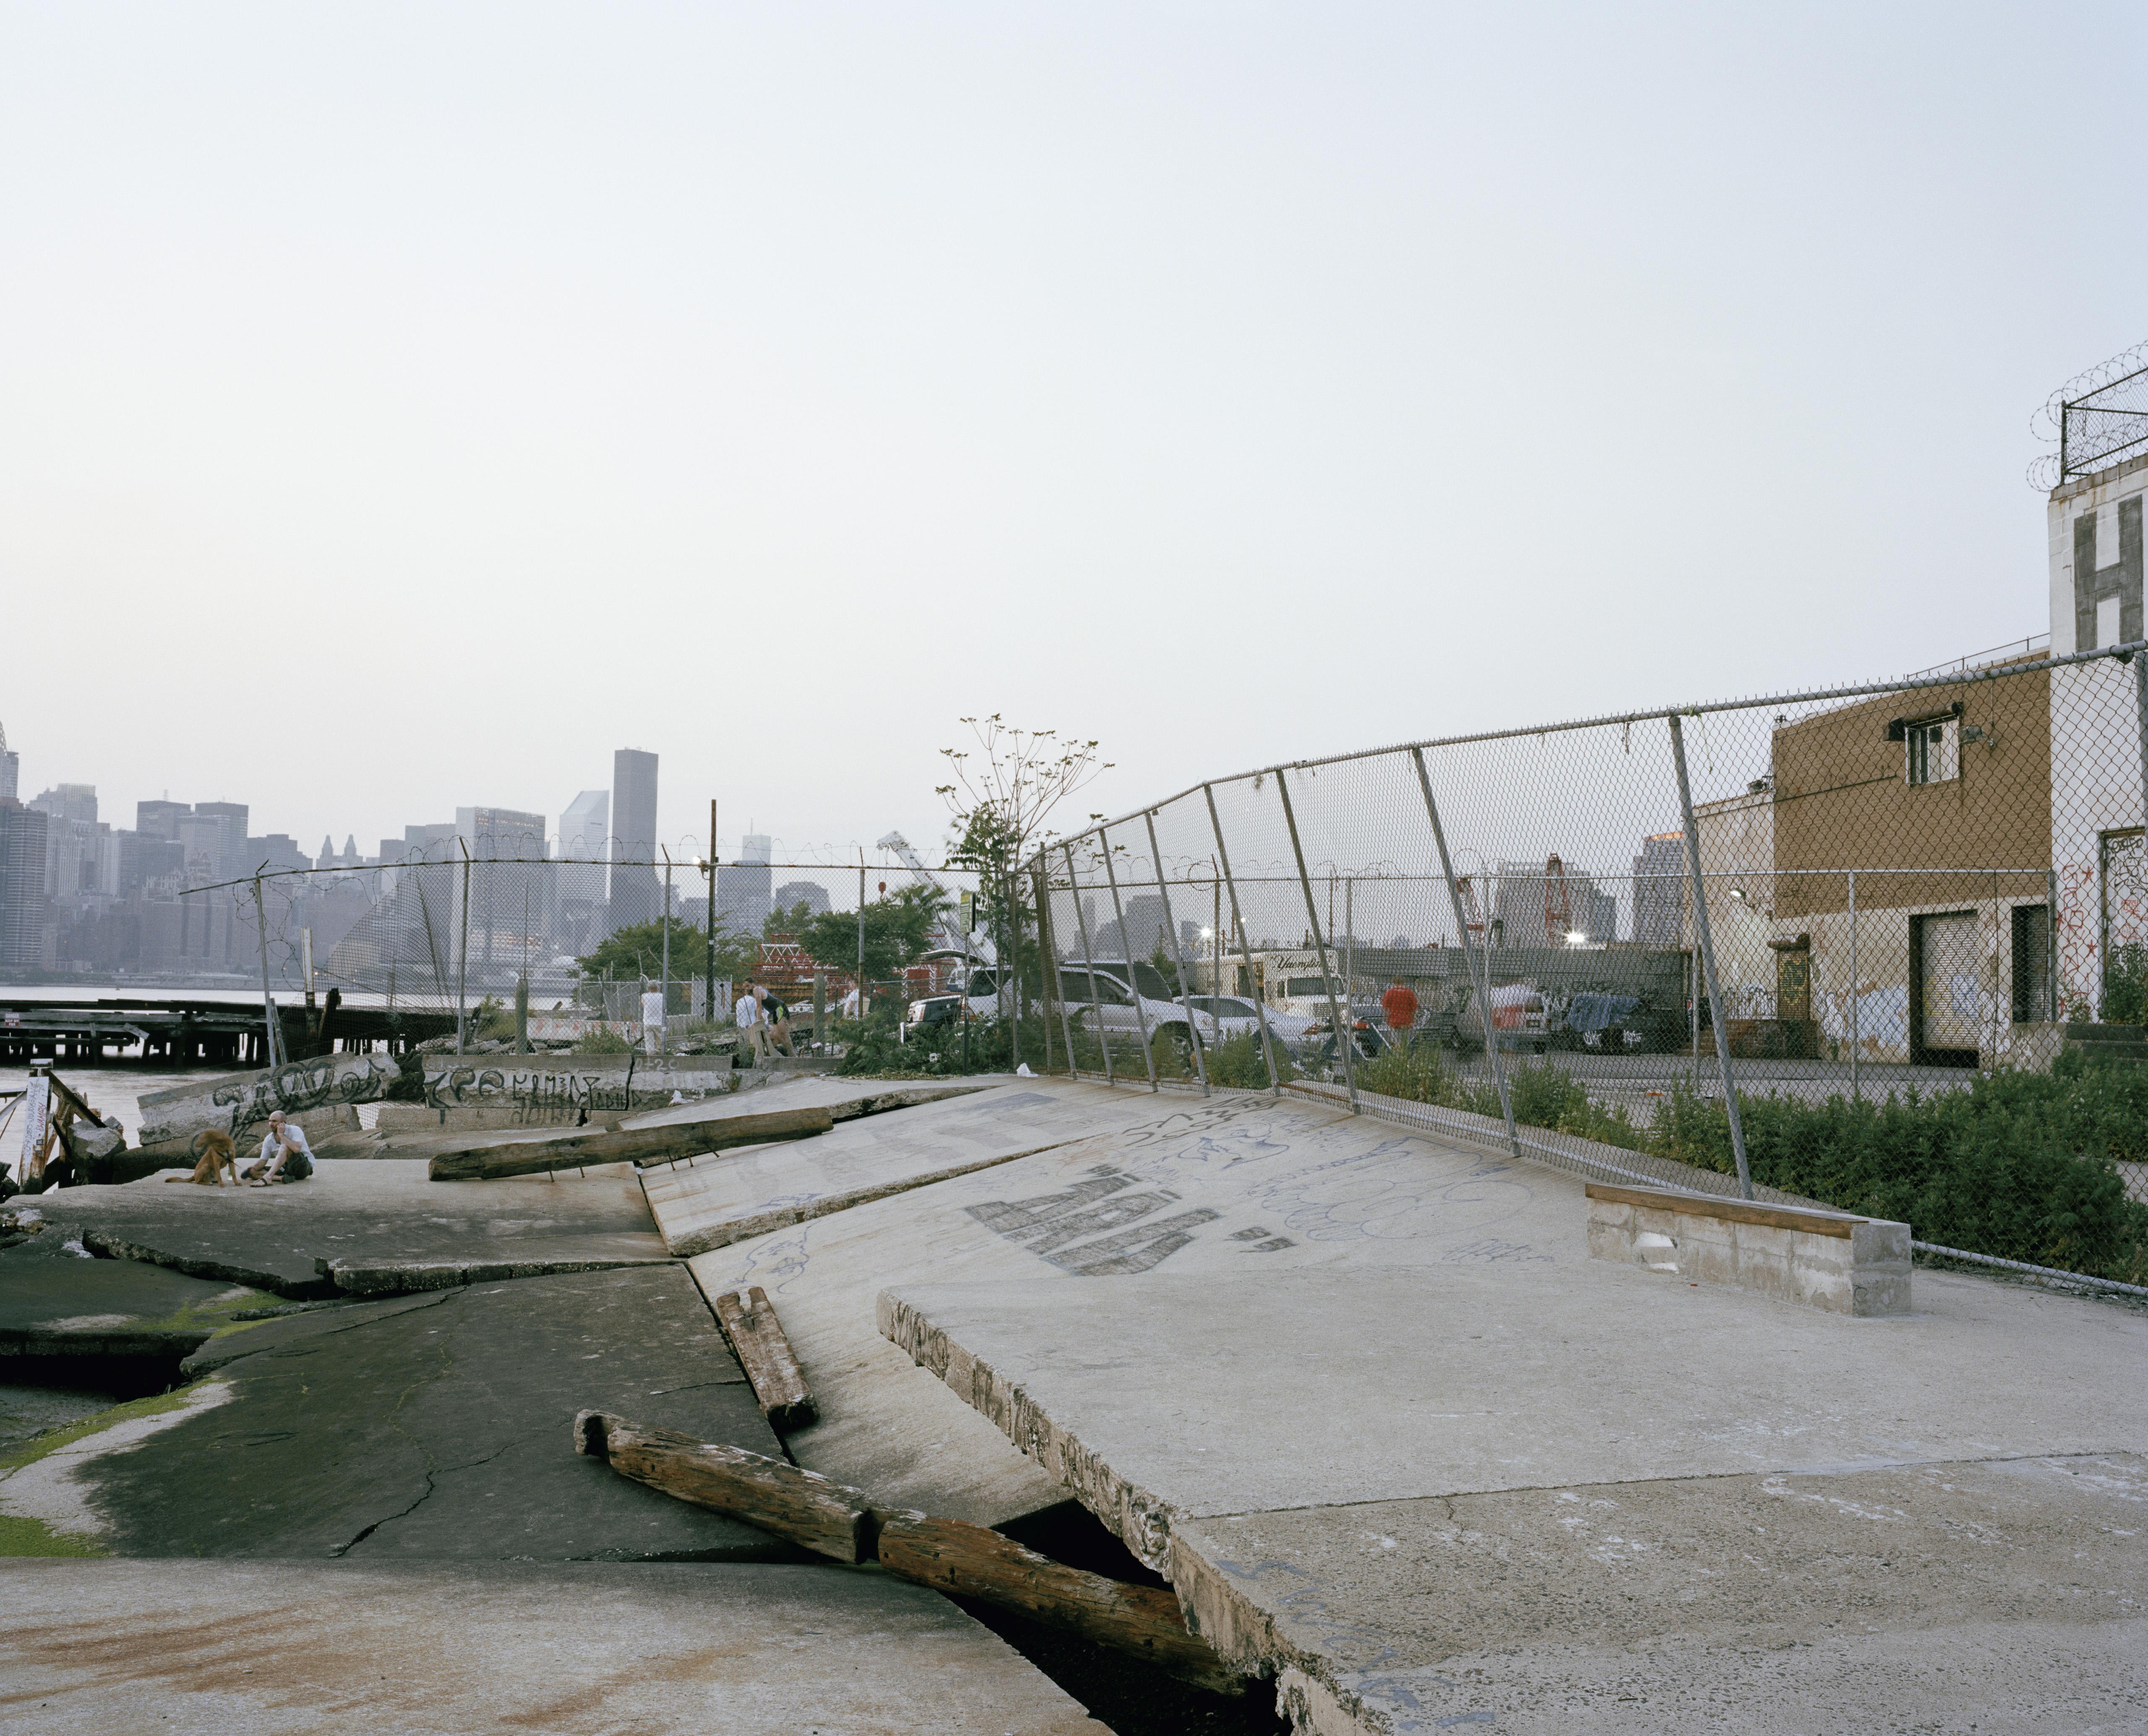 Greenpoint, Brooklyn, NYC, USA